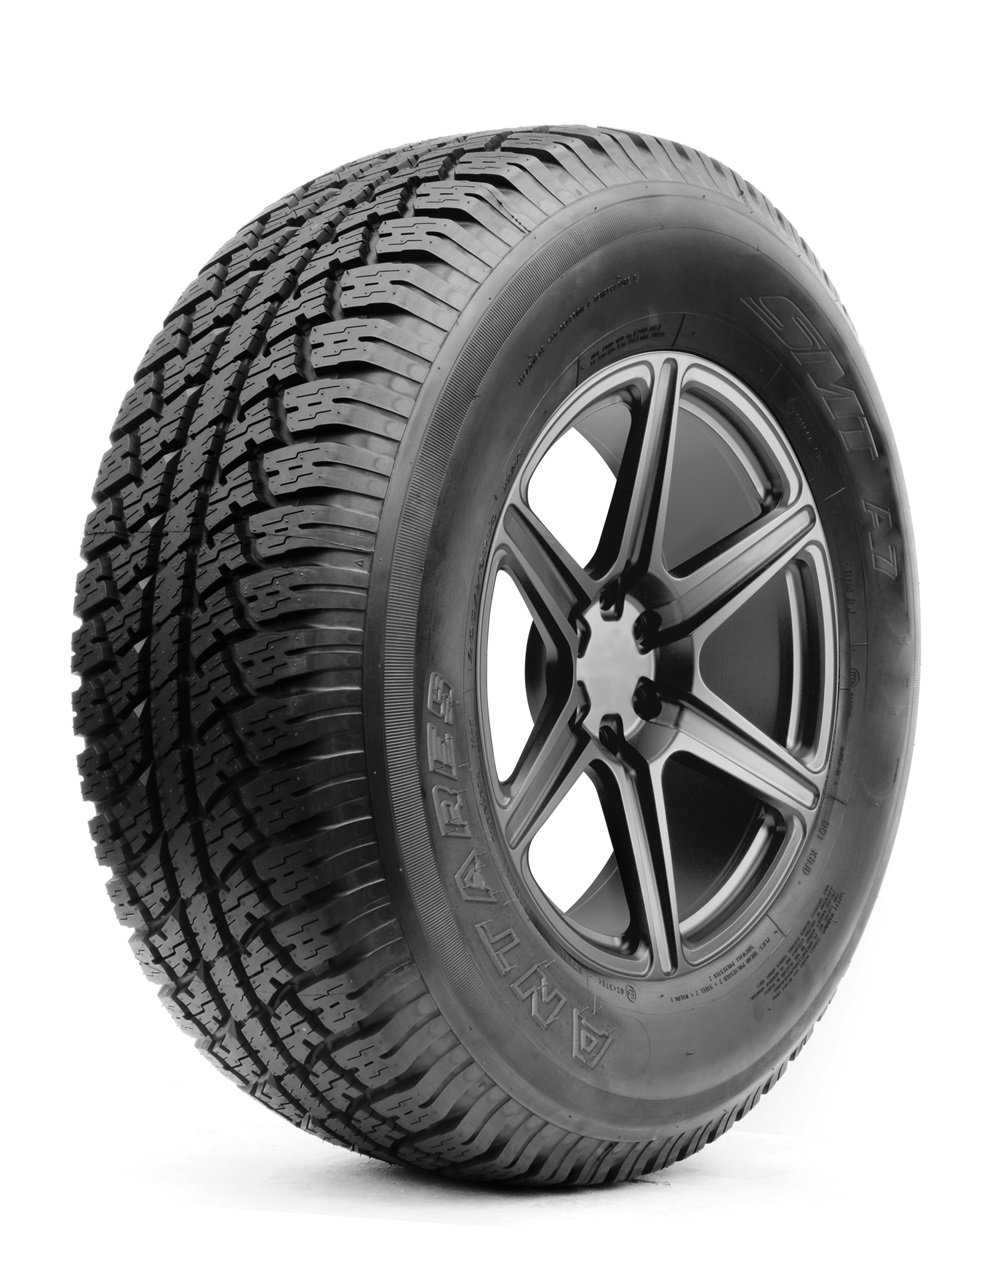 Antares SMT A7 All-Terrain Radial Tire - 235/65R17 104H